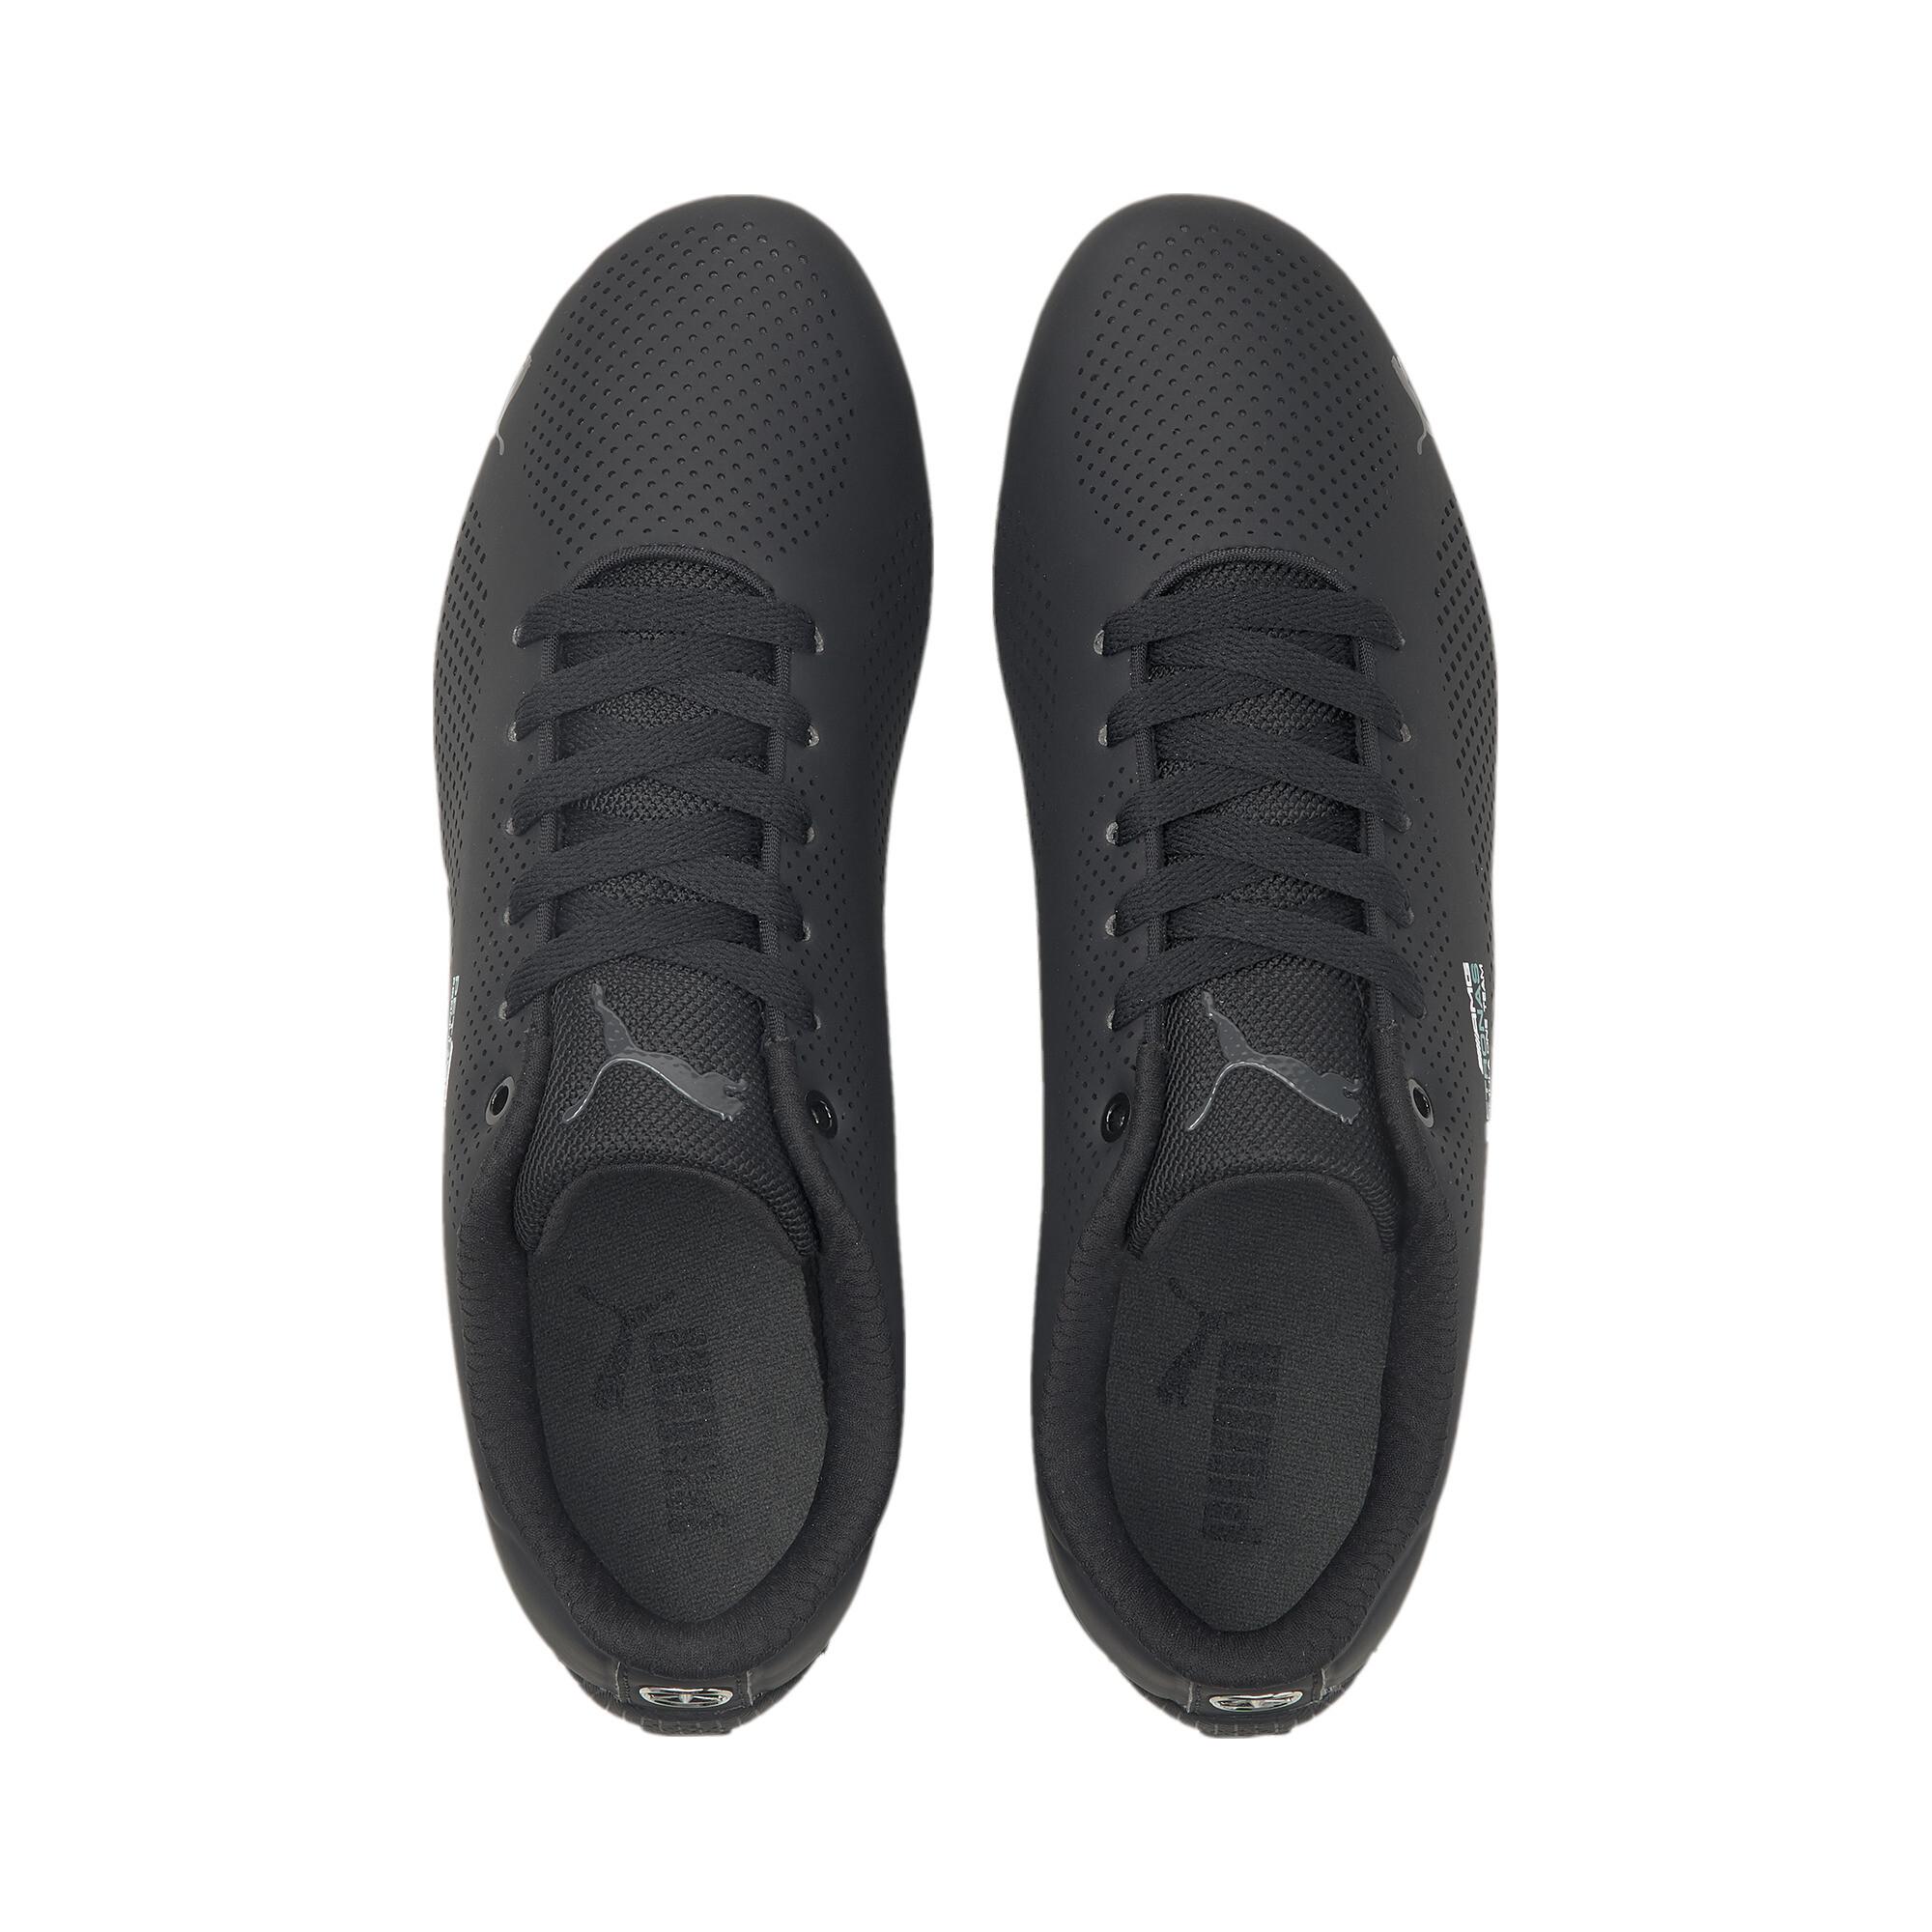 Indexbild 7 - PUMA MERCEDES AMG PETRONAS Drift Cat Ultra Sneaker Unisex Schuhe Neu